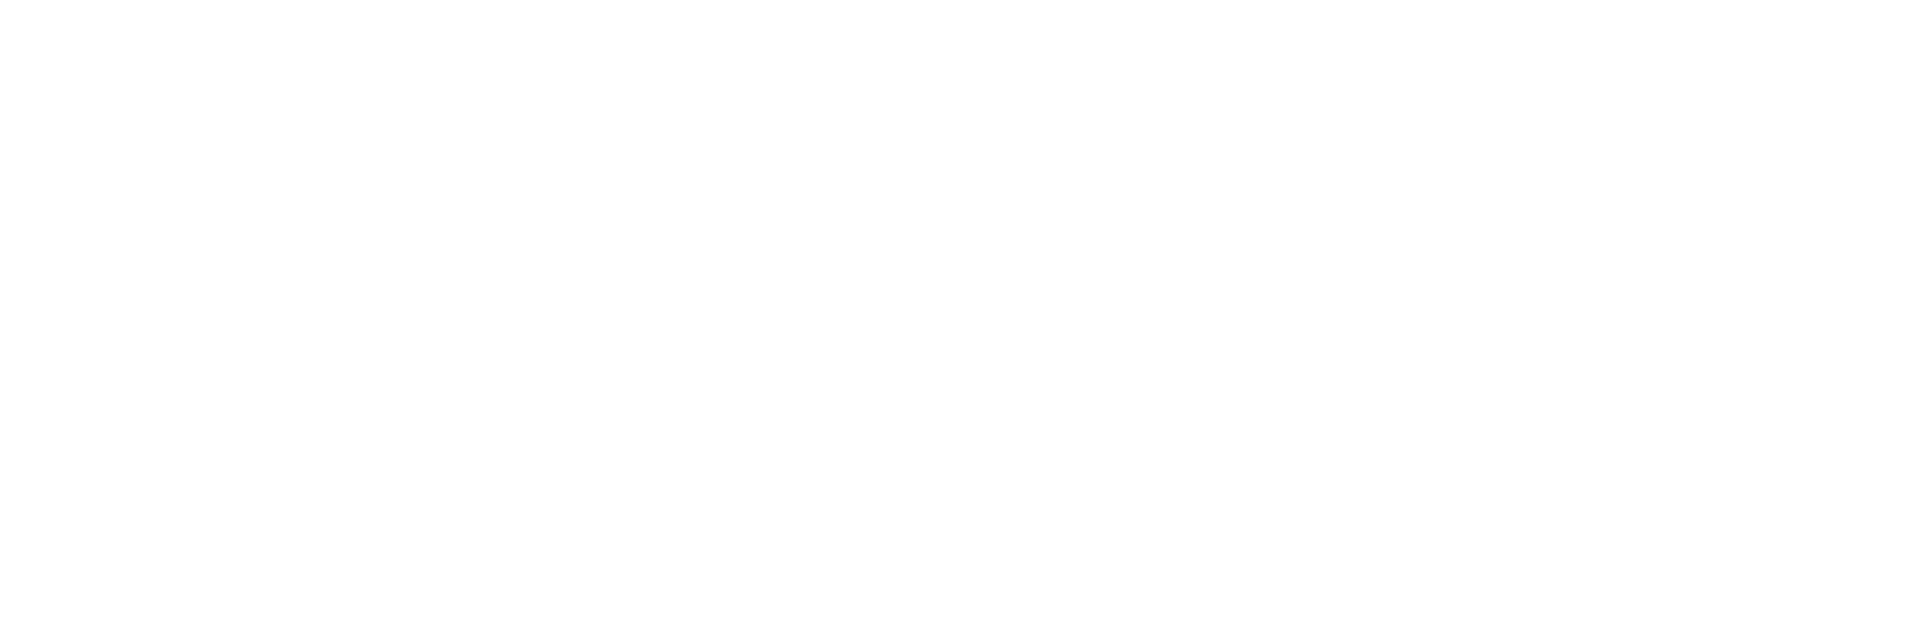 Gold coast newborn photography_WHITElogo